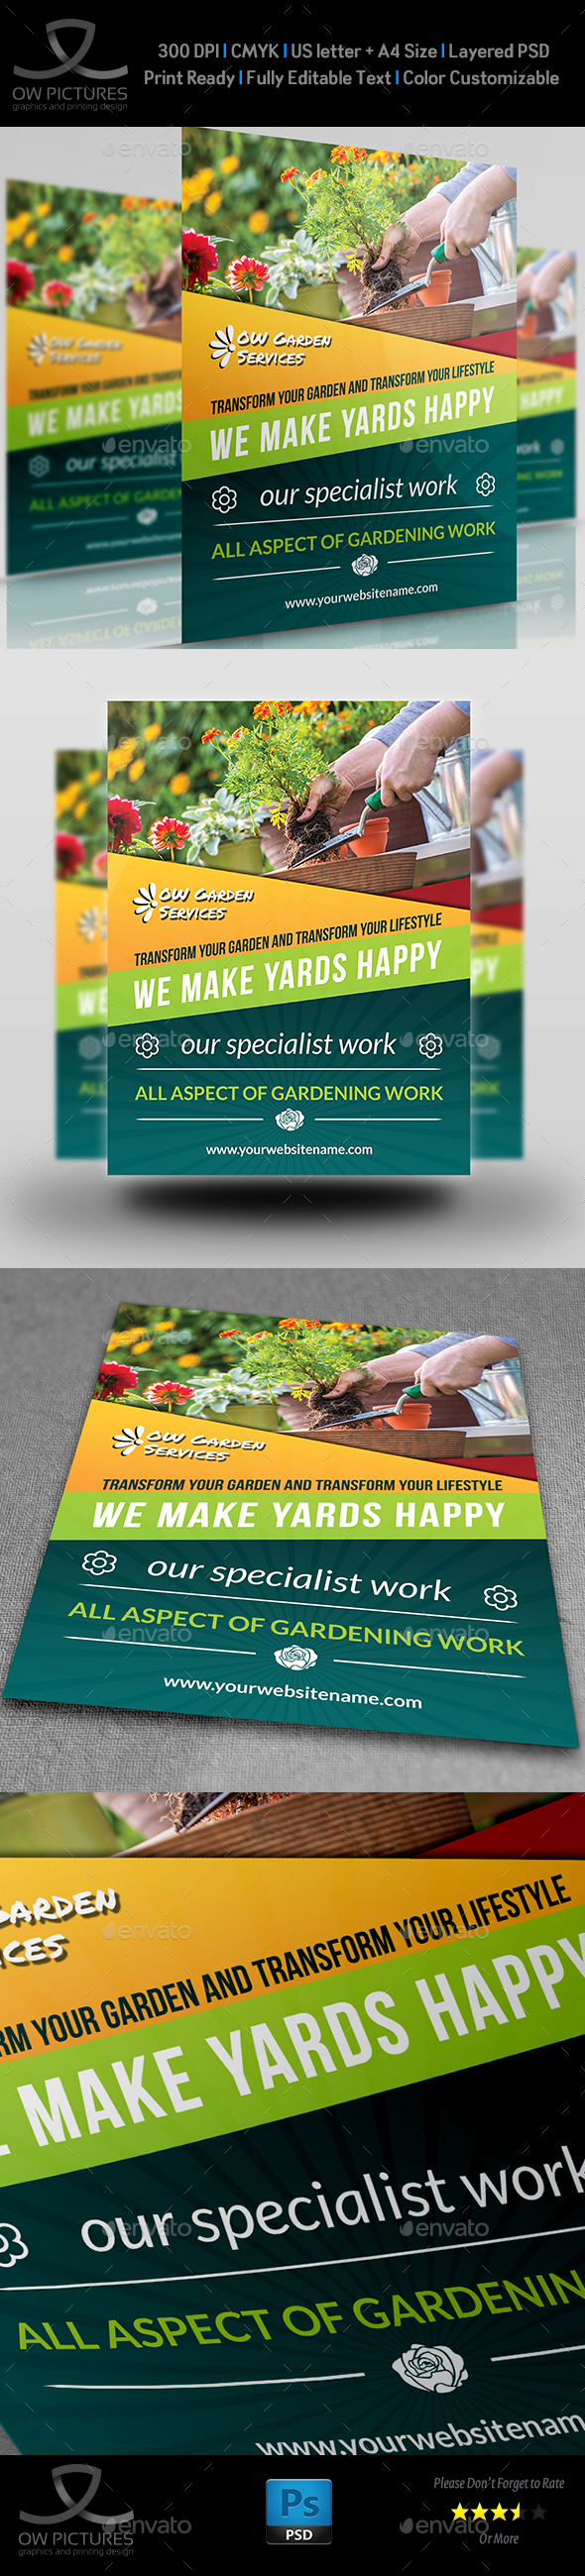 Garden Services Flyer Template Vol.3 - Flyers Print Templates